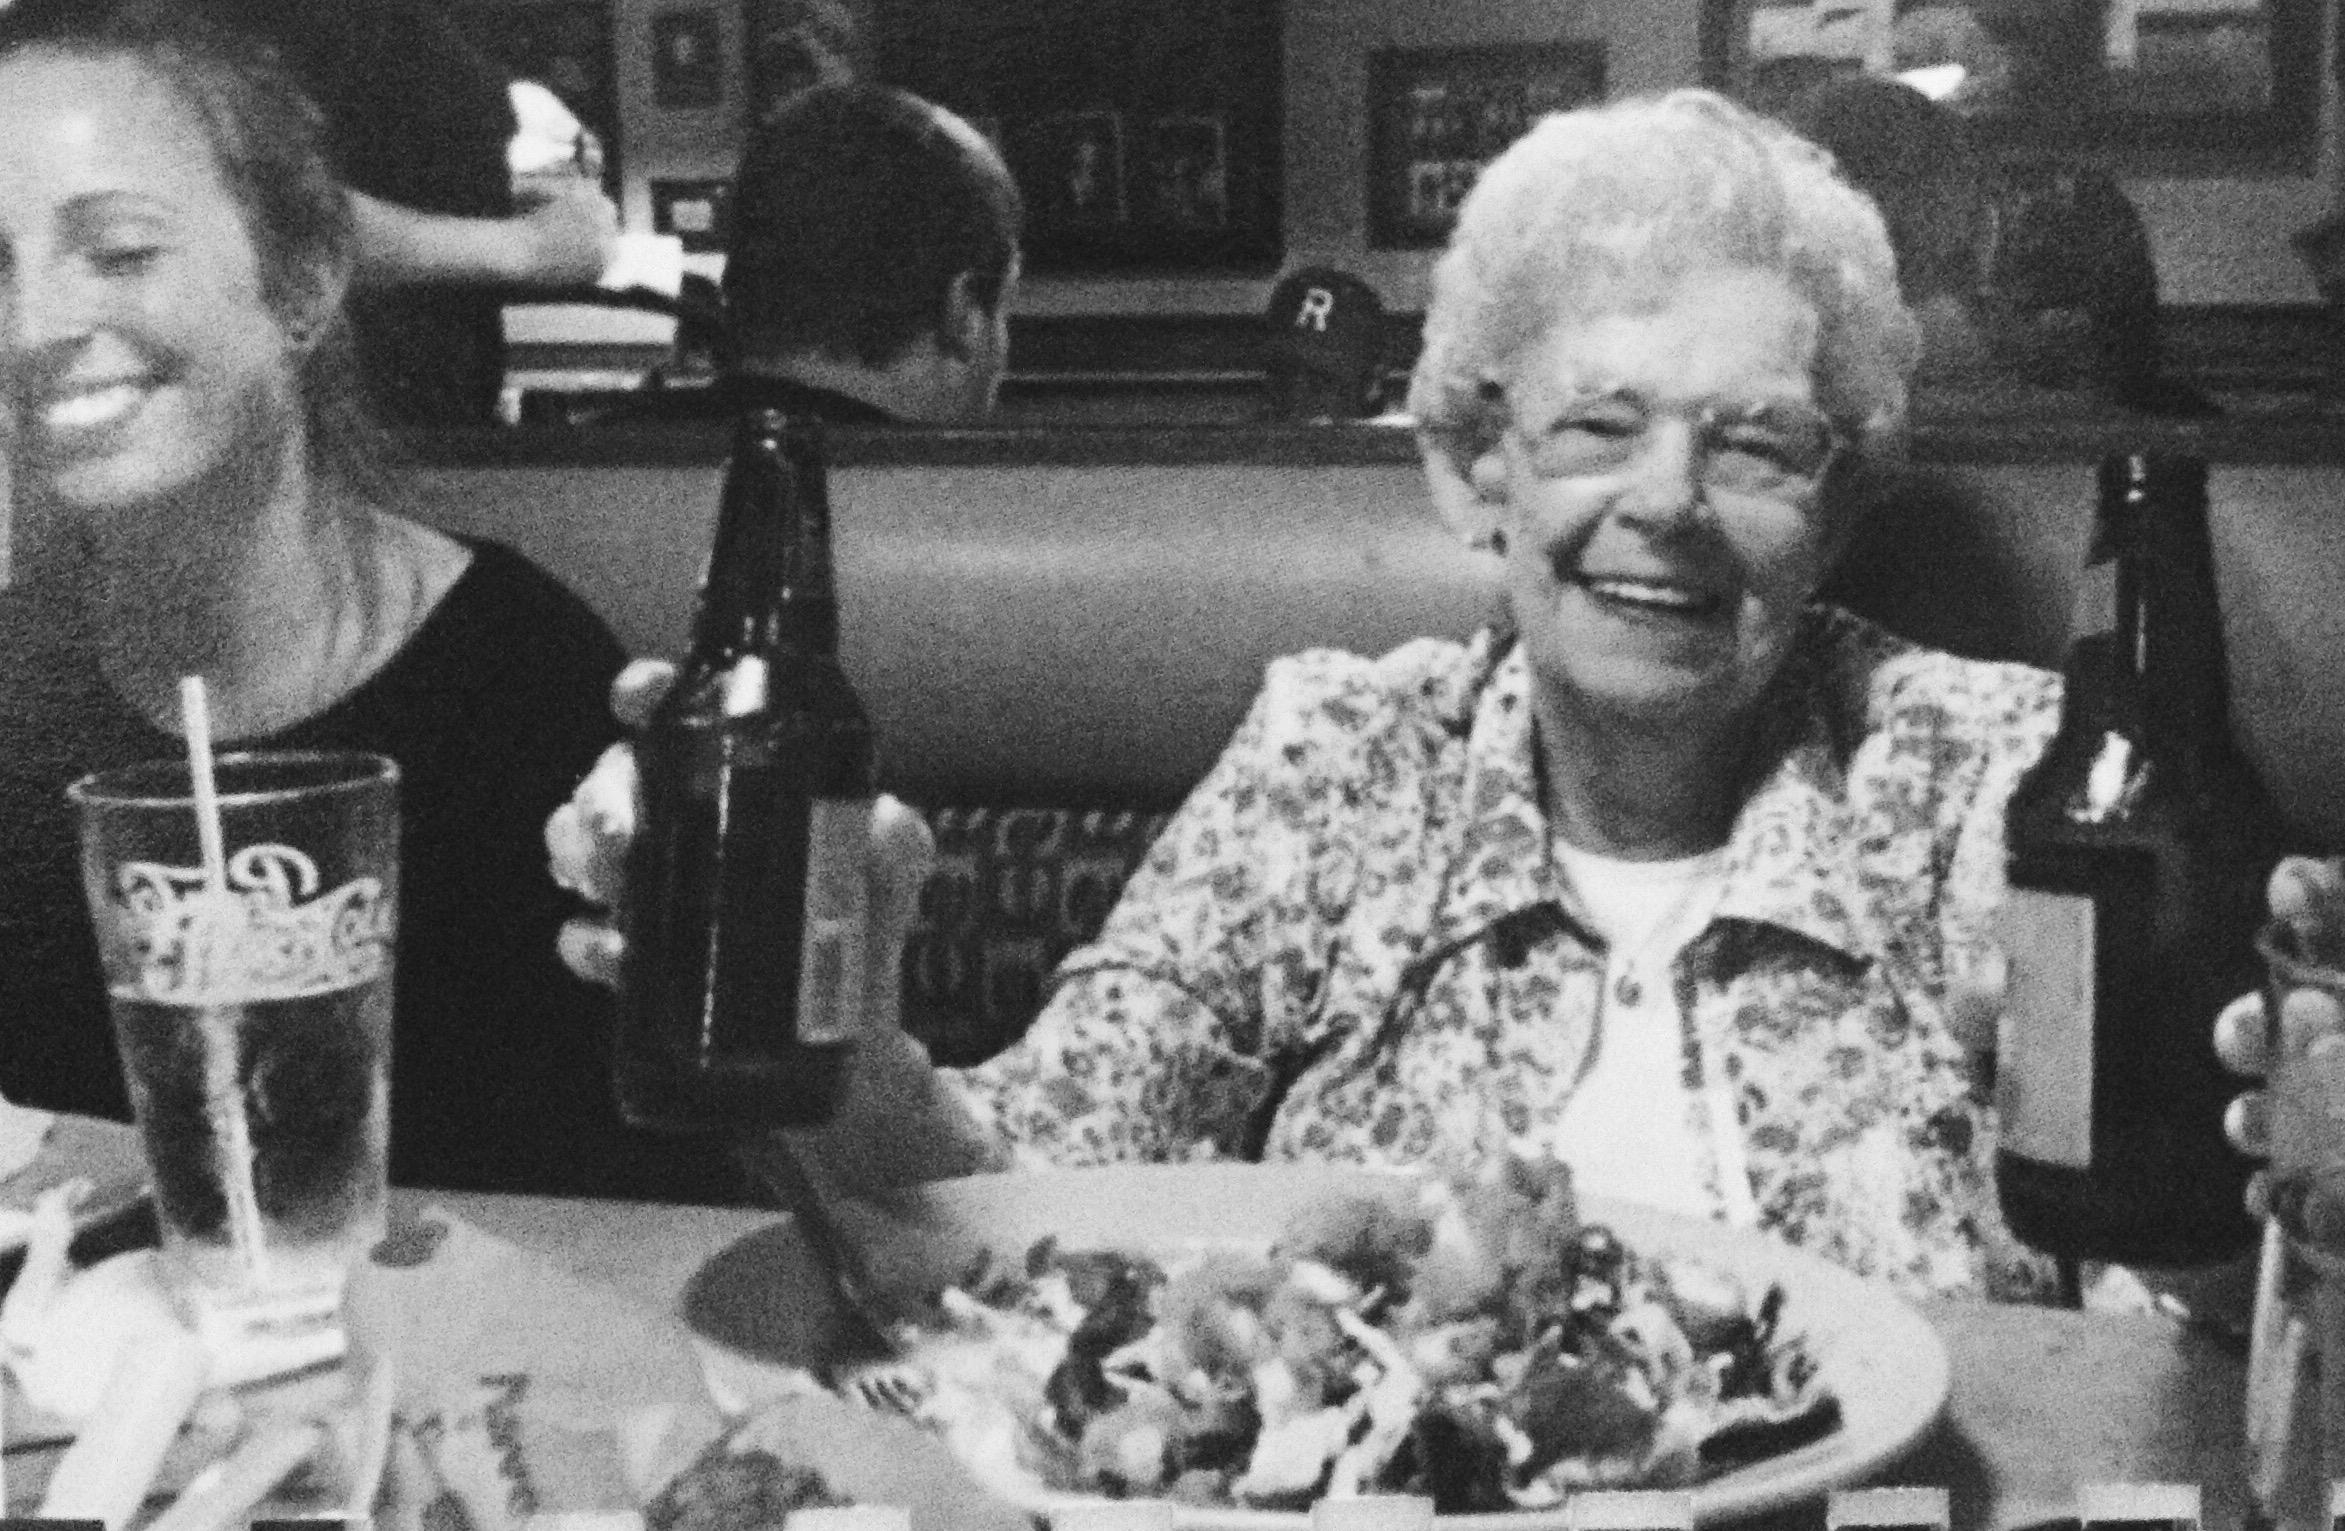 Jennifer's grandmother, Sally